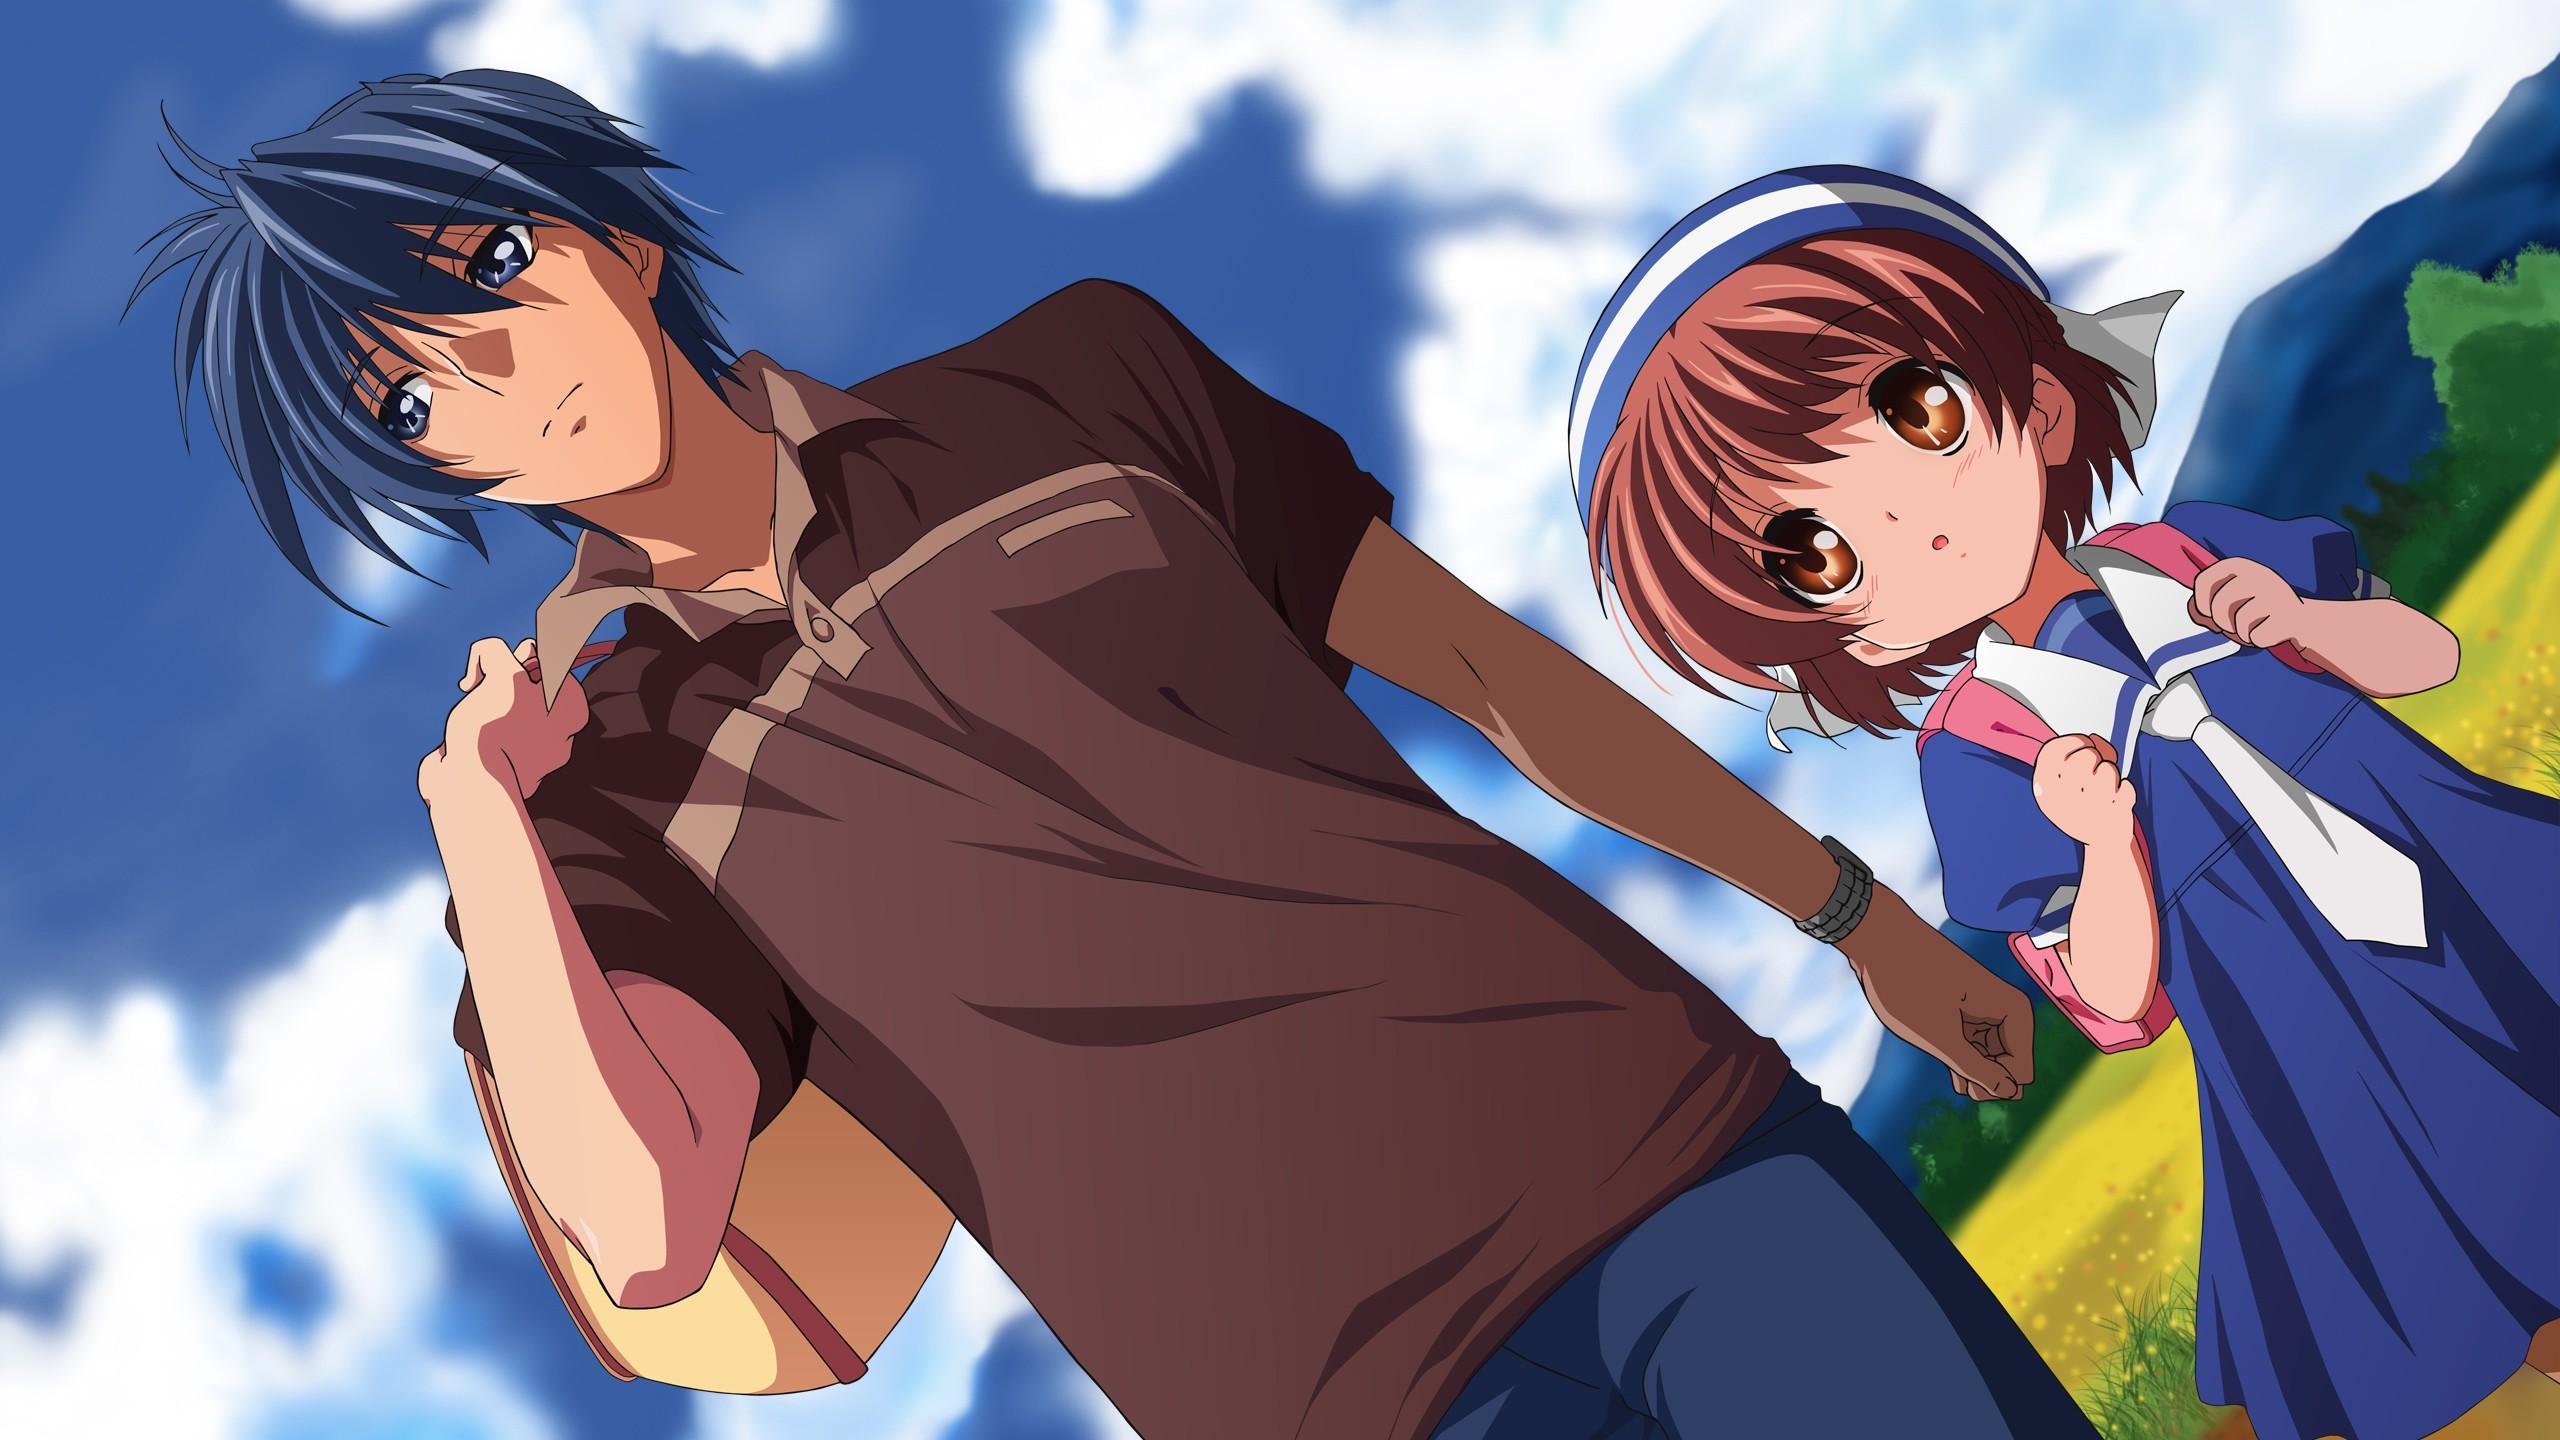 Wallpaper Illustration Anime Girls Anime Boys Cartoon